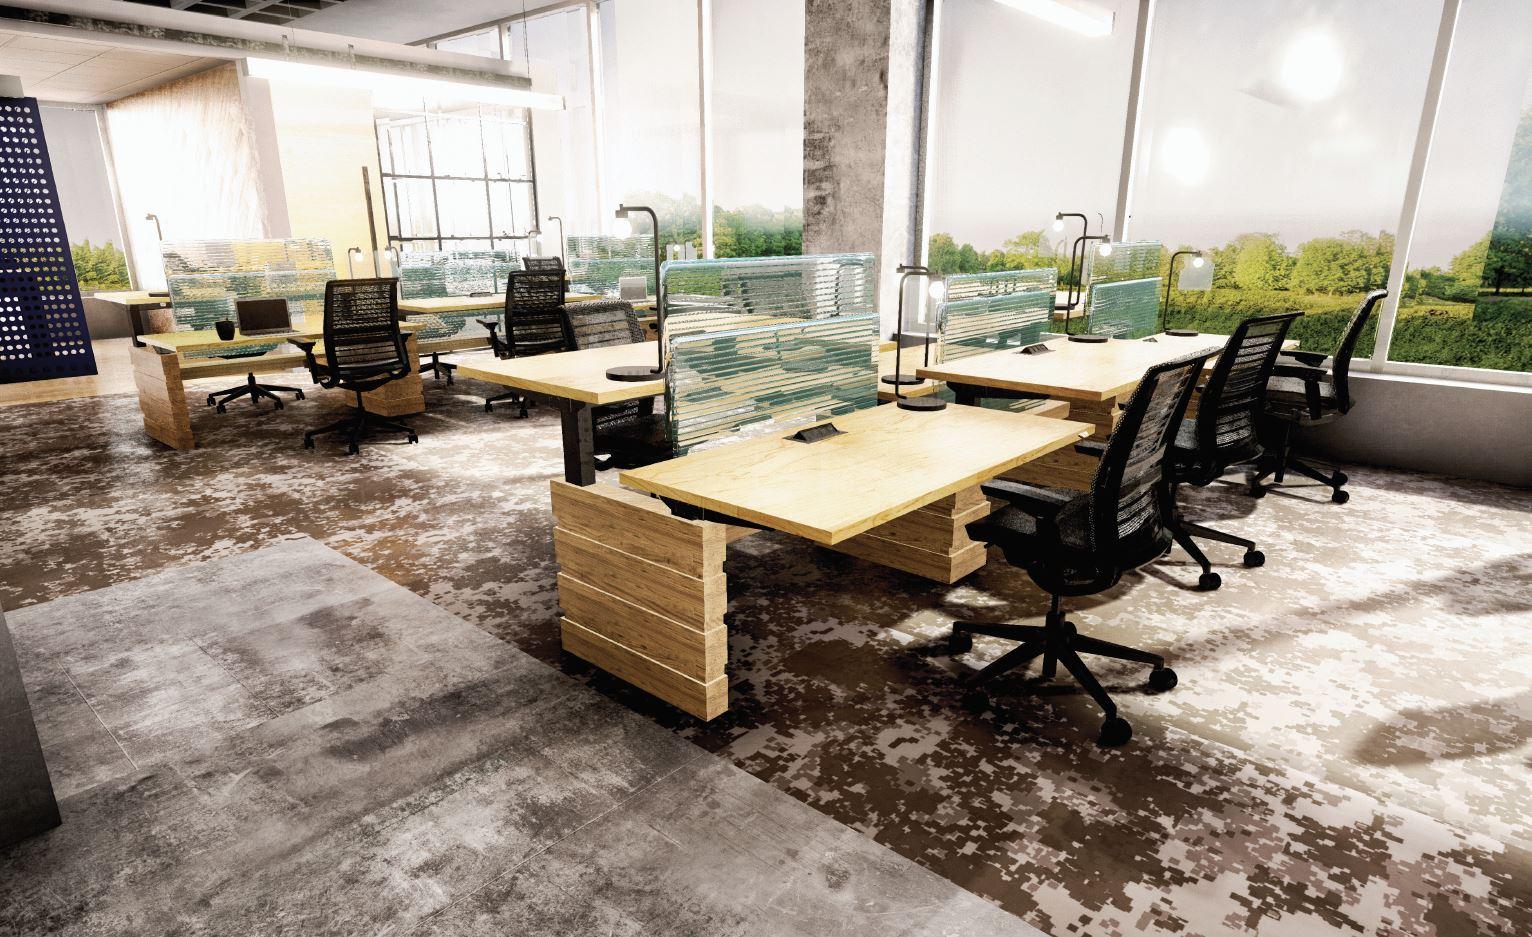 UNILEVER HEADQUARTERS   VR to visualize West Elm furniture in a corporate headquarters